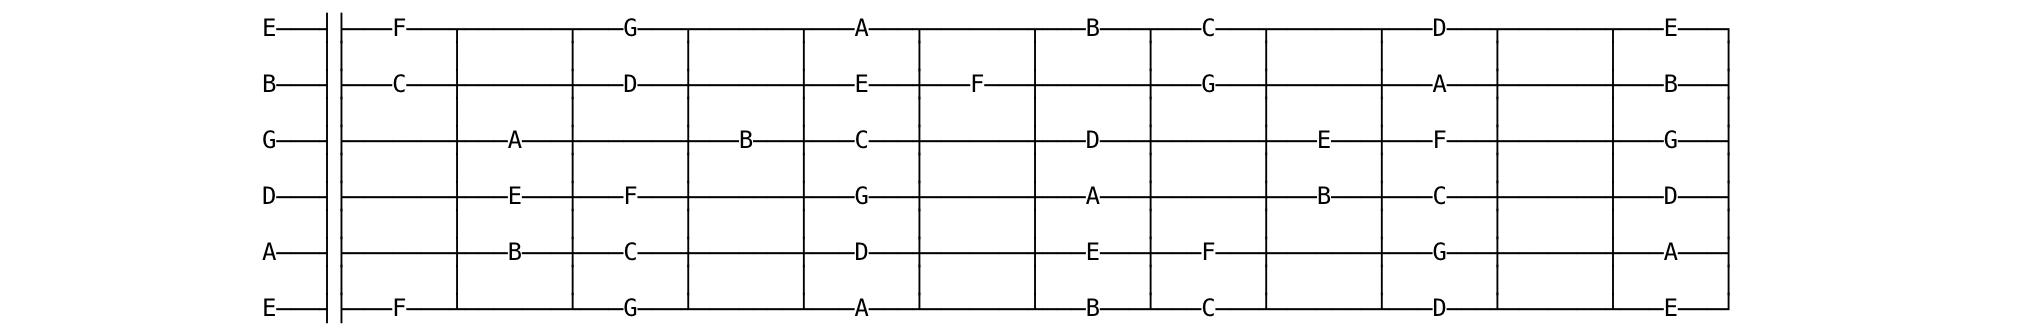 guitar fretboard diagram white keys